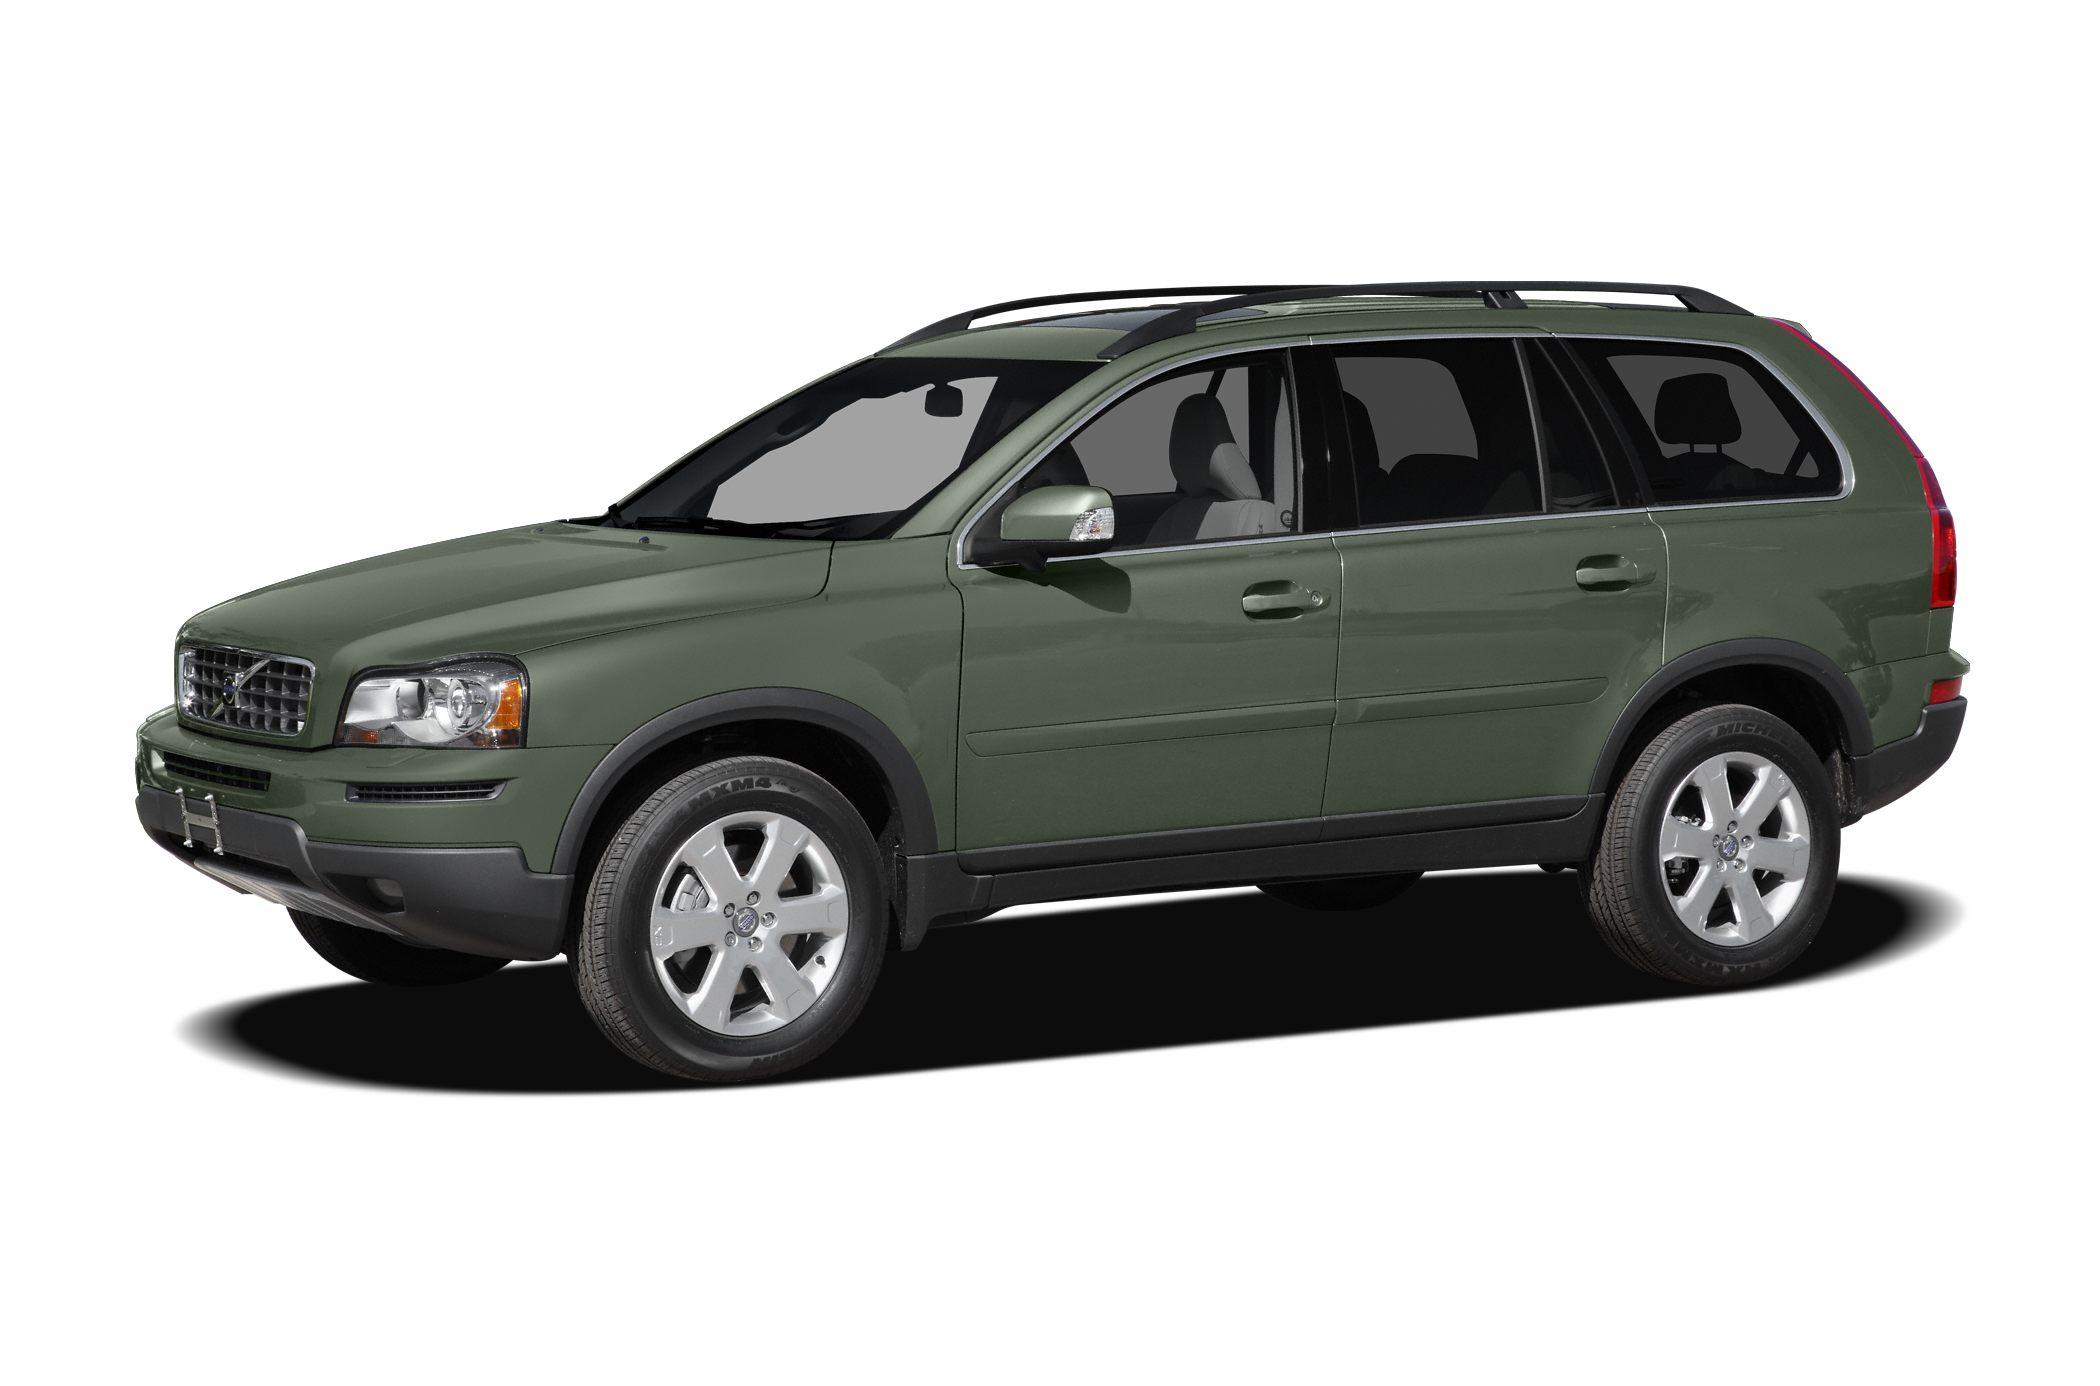 2010 Volvo XC90 32 Miles 76366Color Gray Stock 16489 VIN YV4982CZ7A1539195